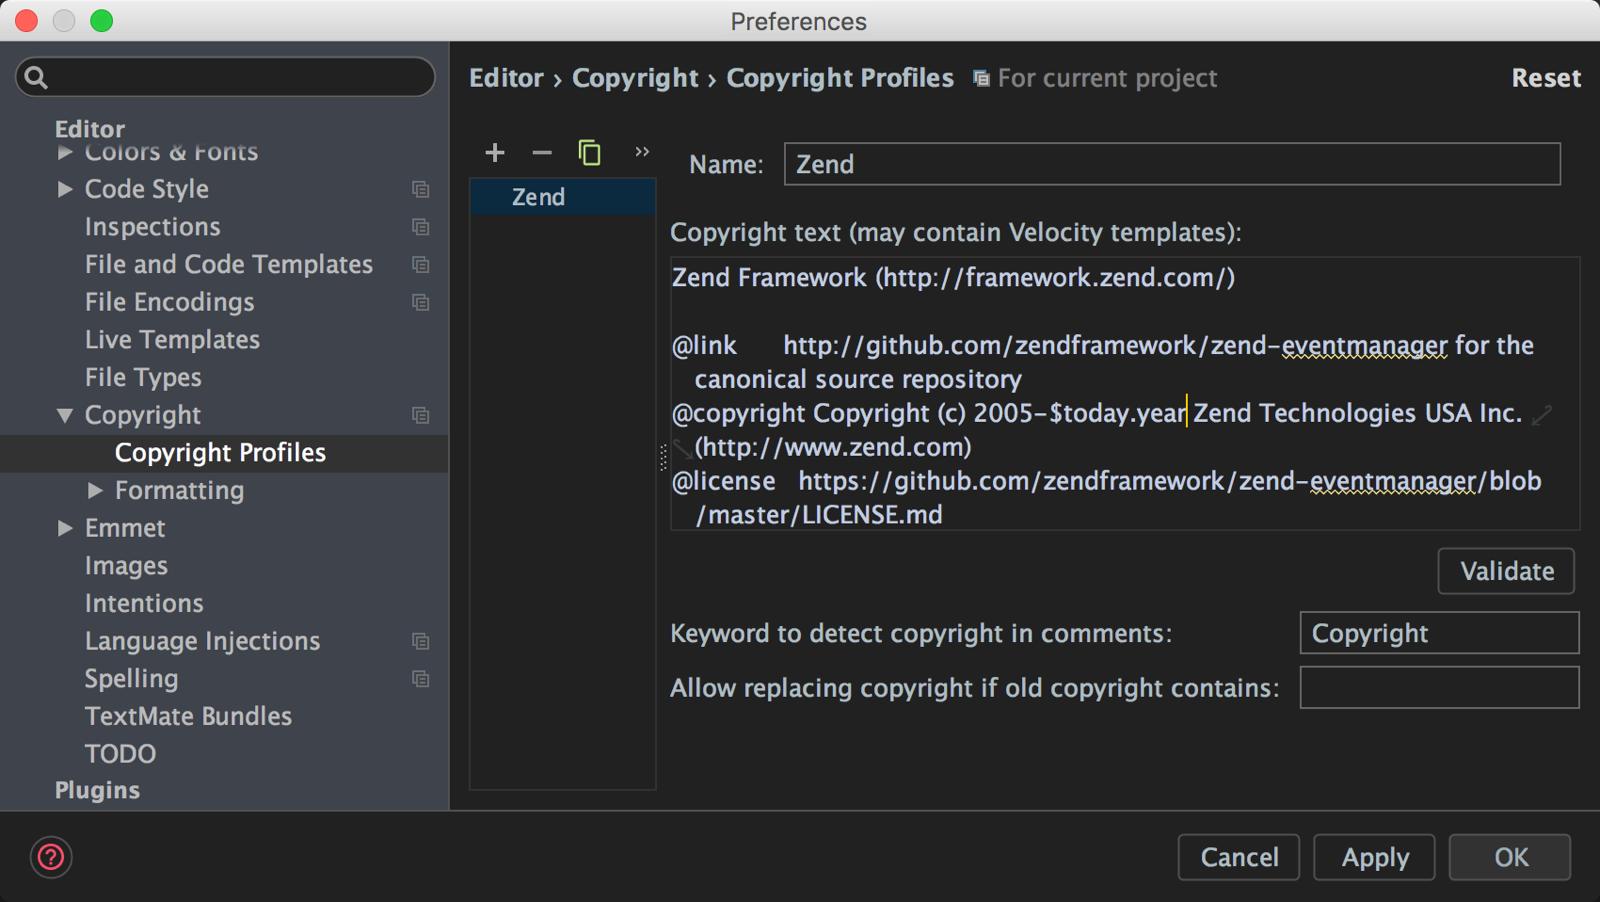 Copyright Profile